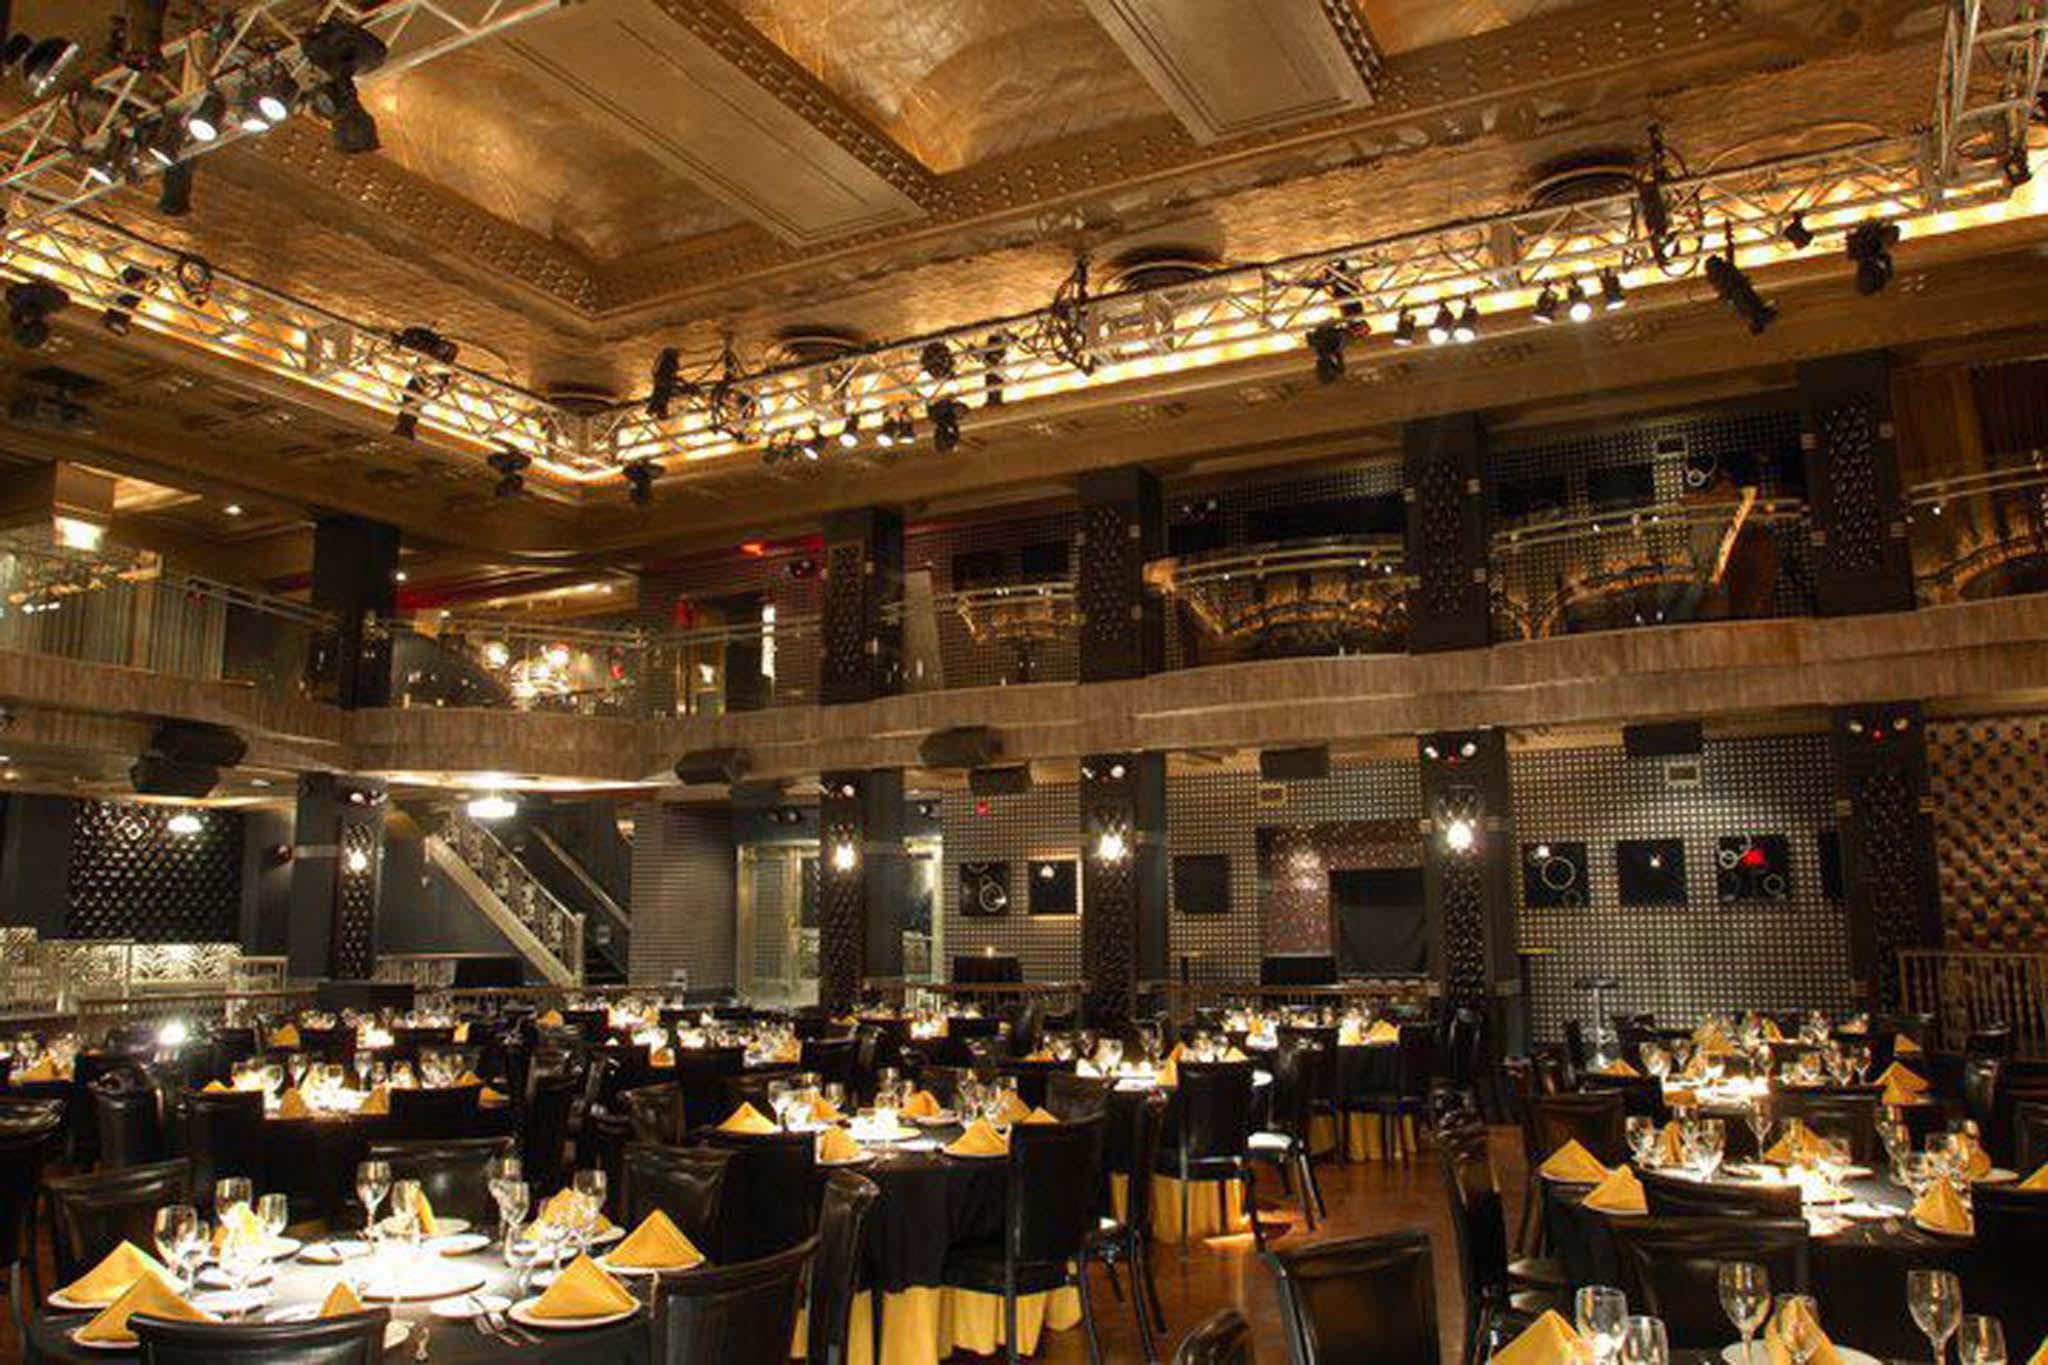 Joe Battaglia and the New York Big Band: New Year's Eve Gala